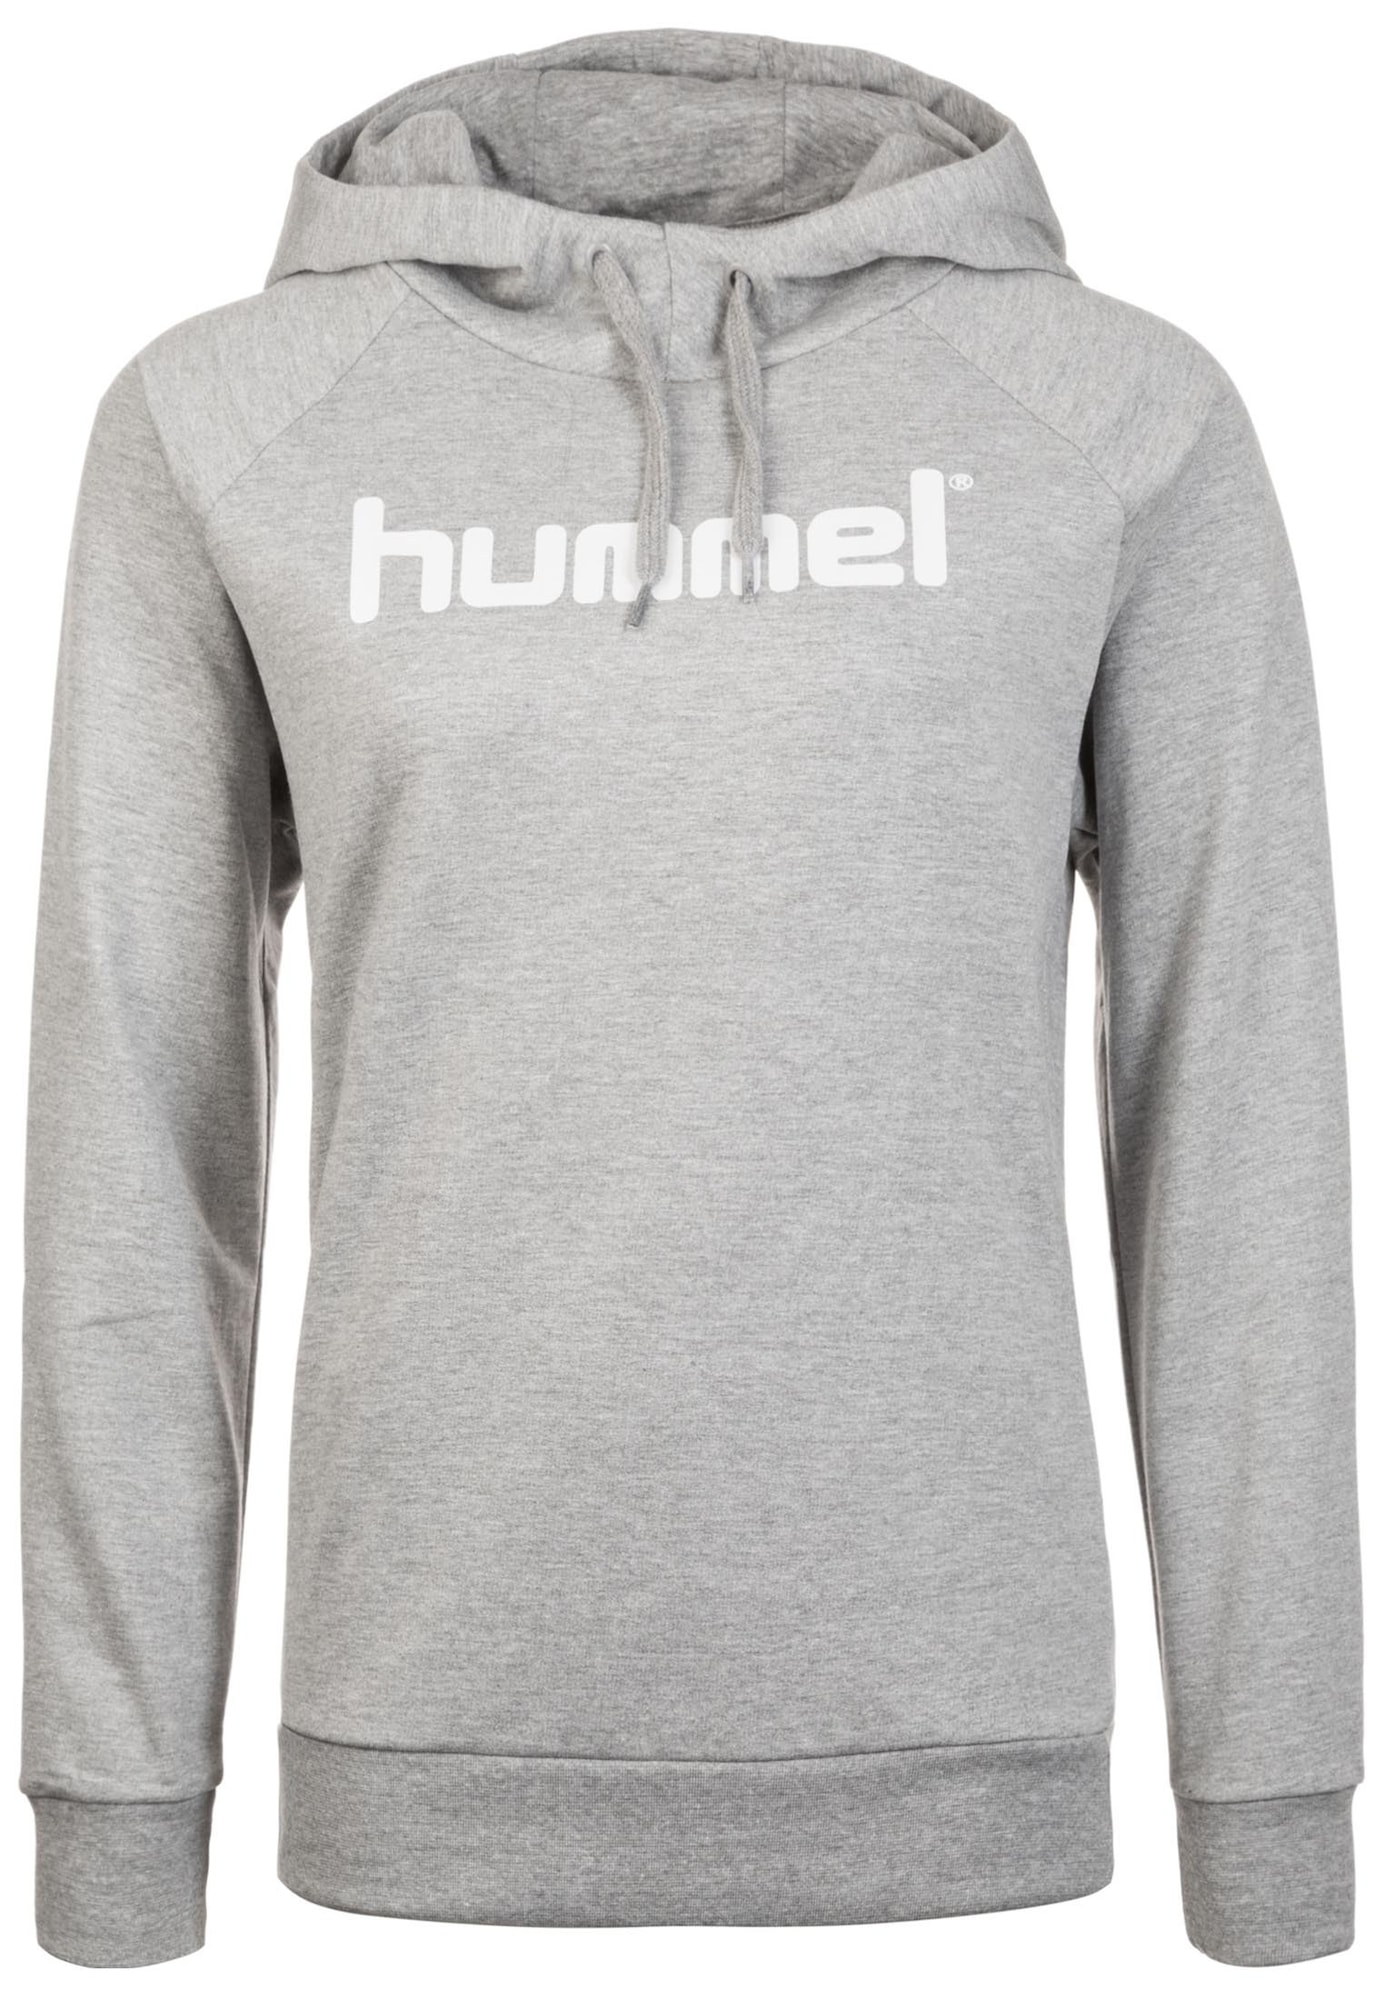 Kapuzenpullover | Bekleidung > Pullover > Kapuzenpullover | Grau - Weiß | Hummel